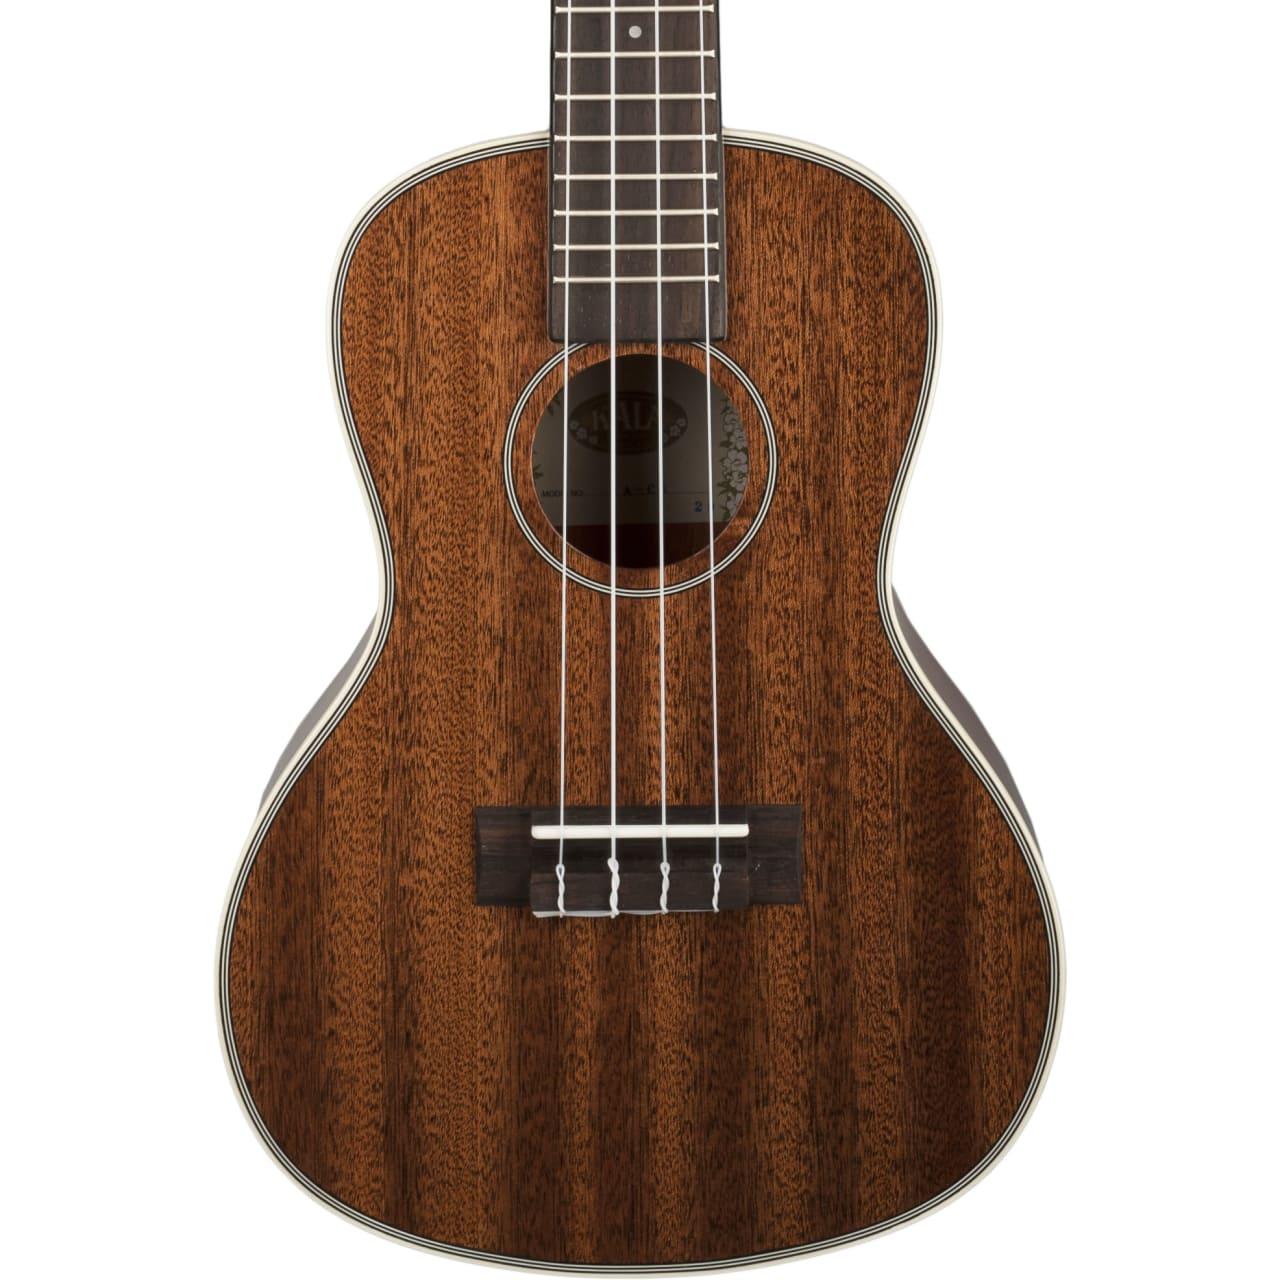 Kala Ka Cg : kala ka cg glossed mahogany concert ukulele reverb ~ Vivirlamusica.com Haus und Dekorationen